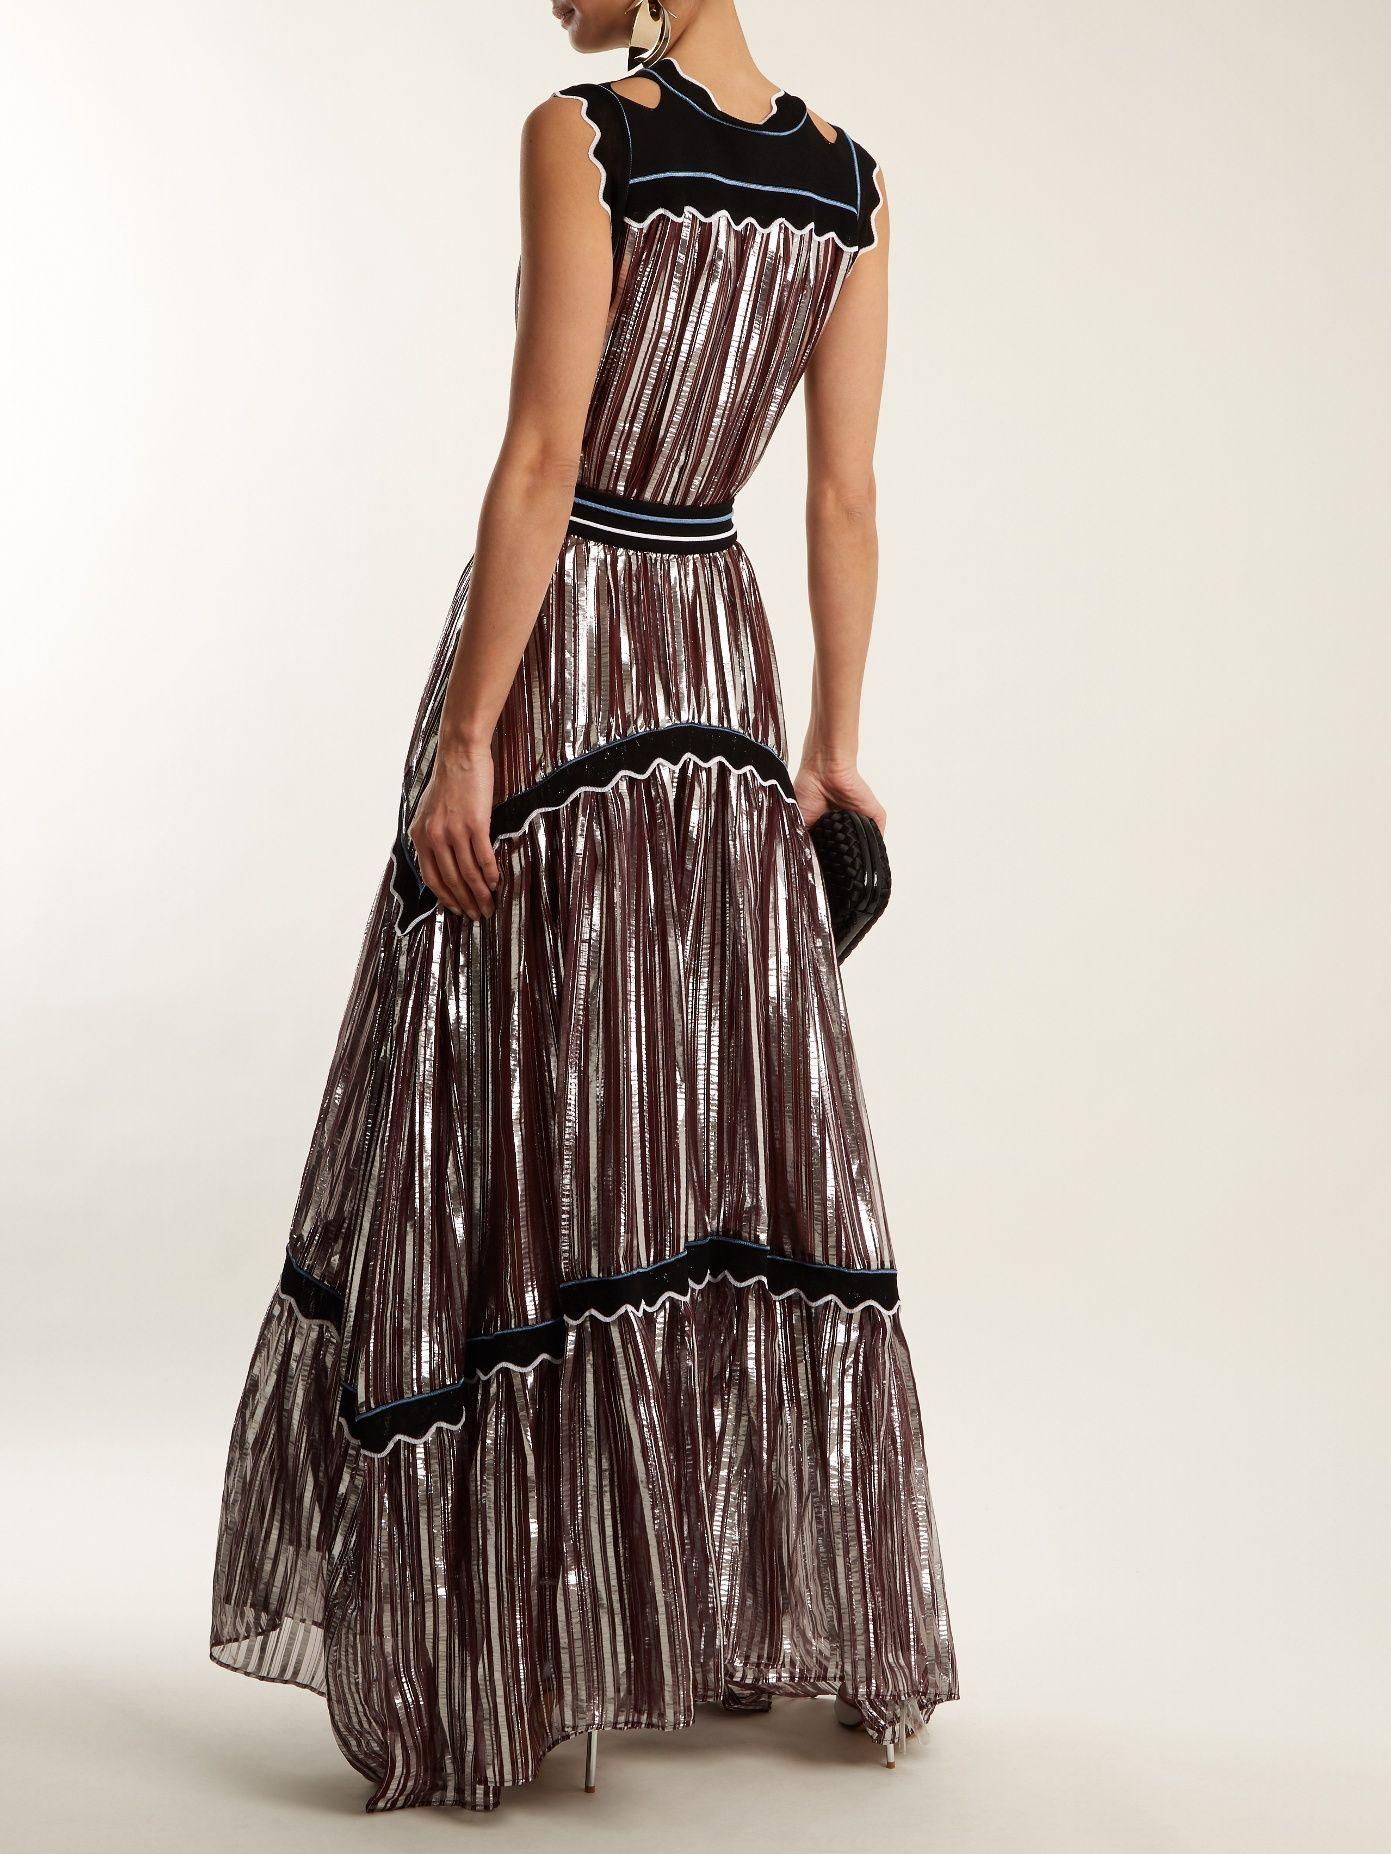 Stripedjacquard crepe gown peter pilotto fashion lust